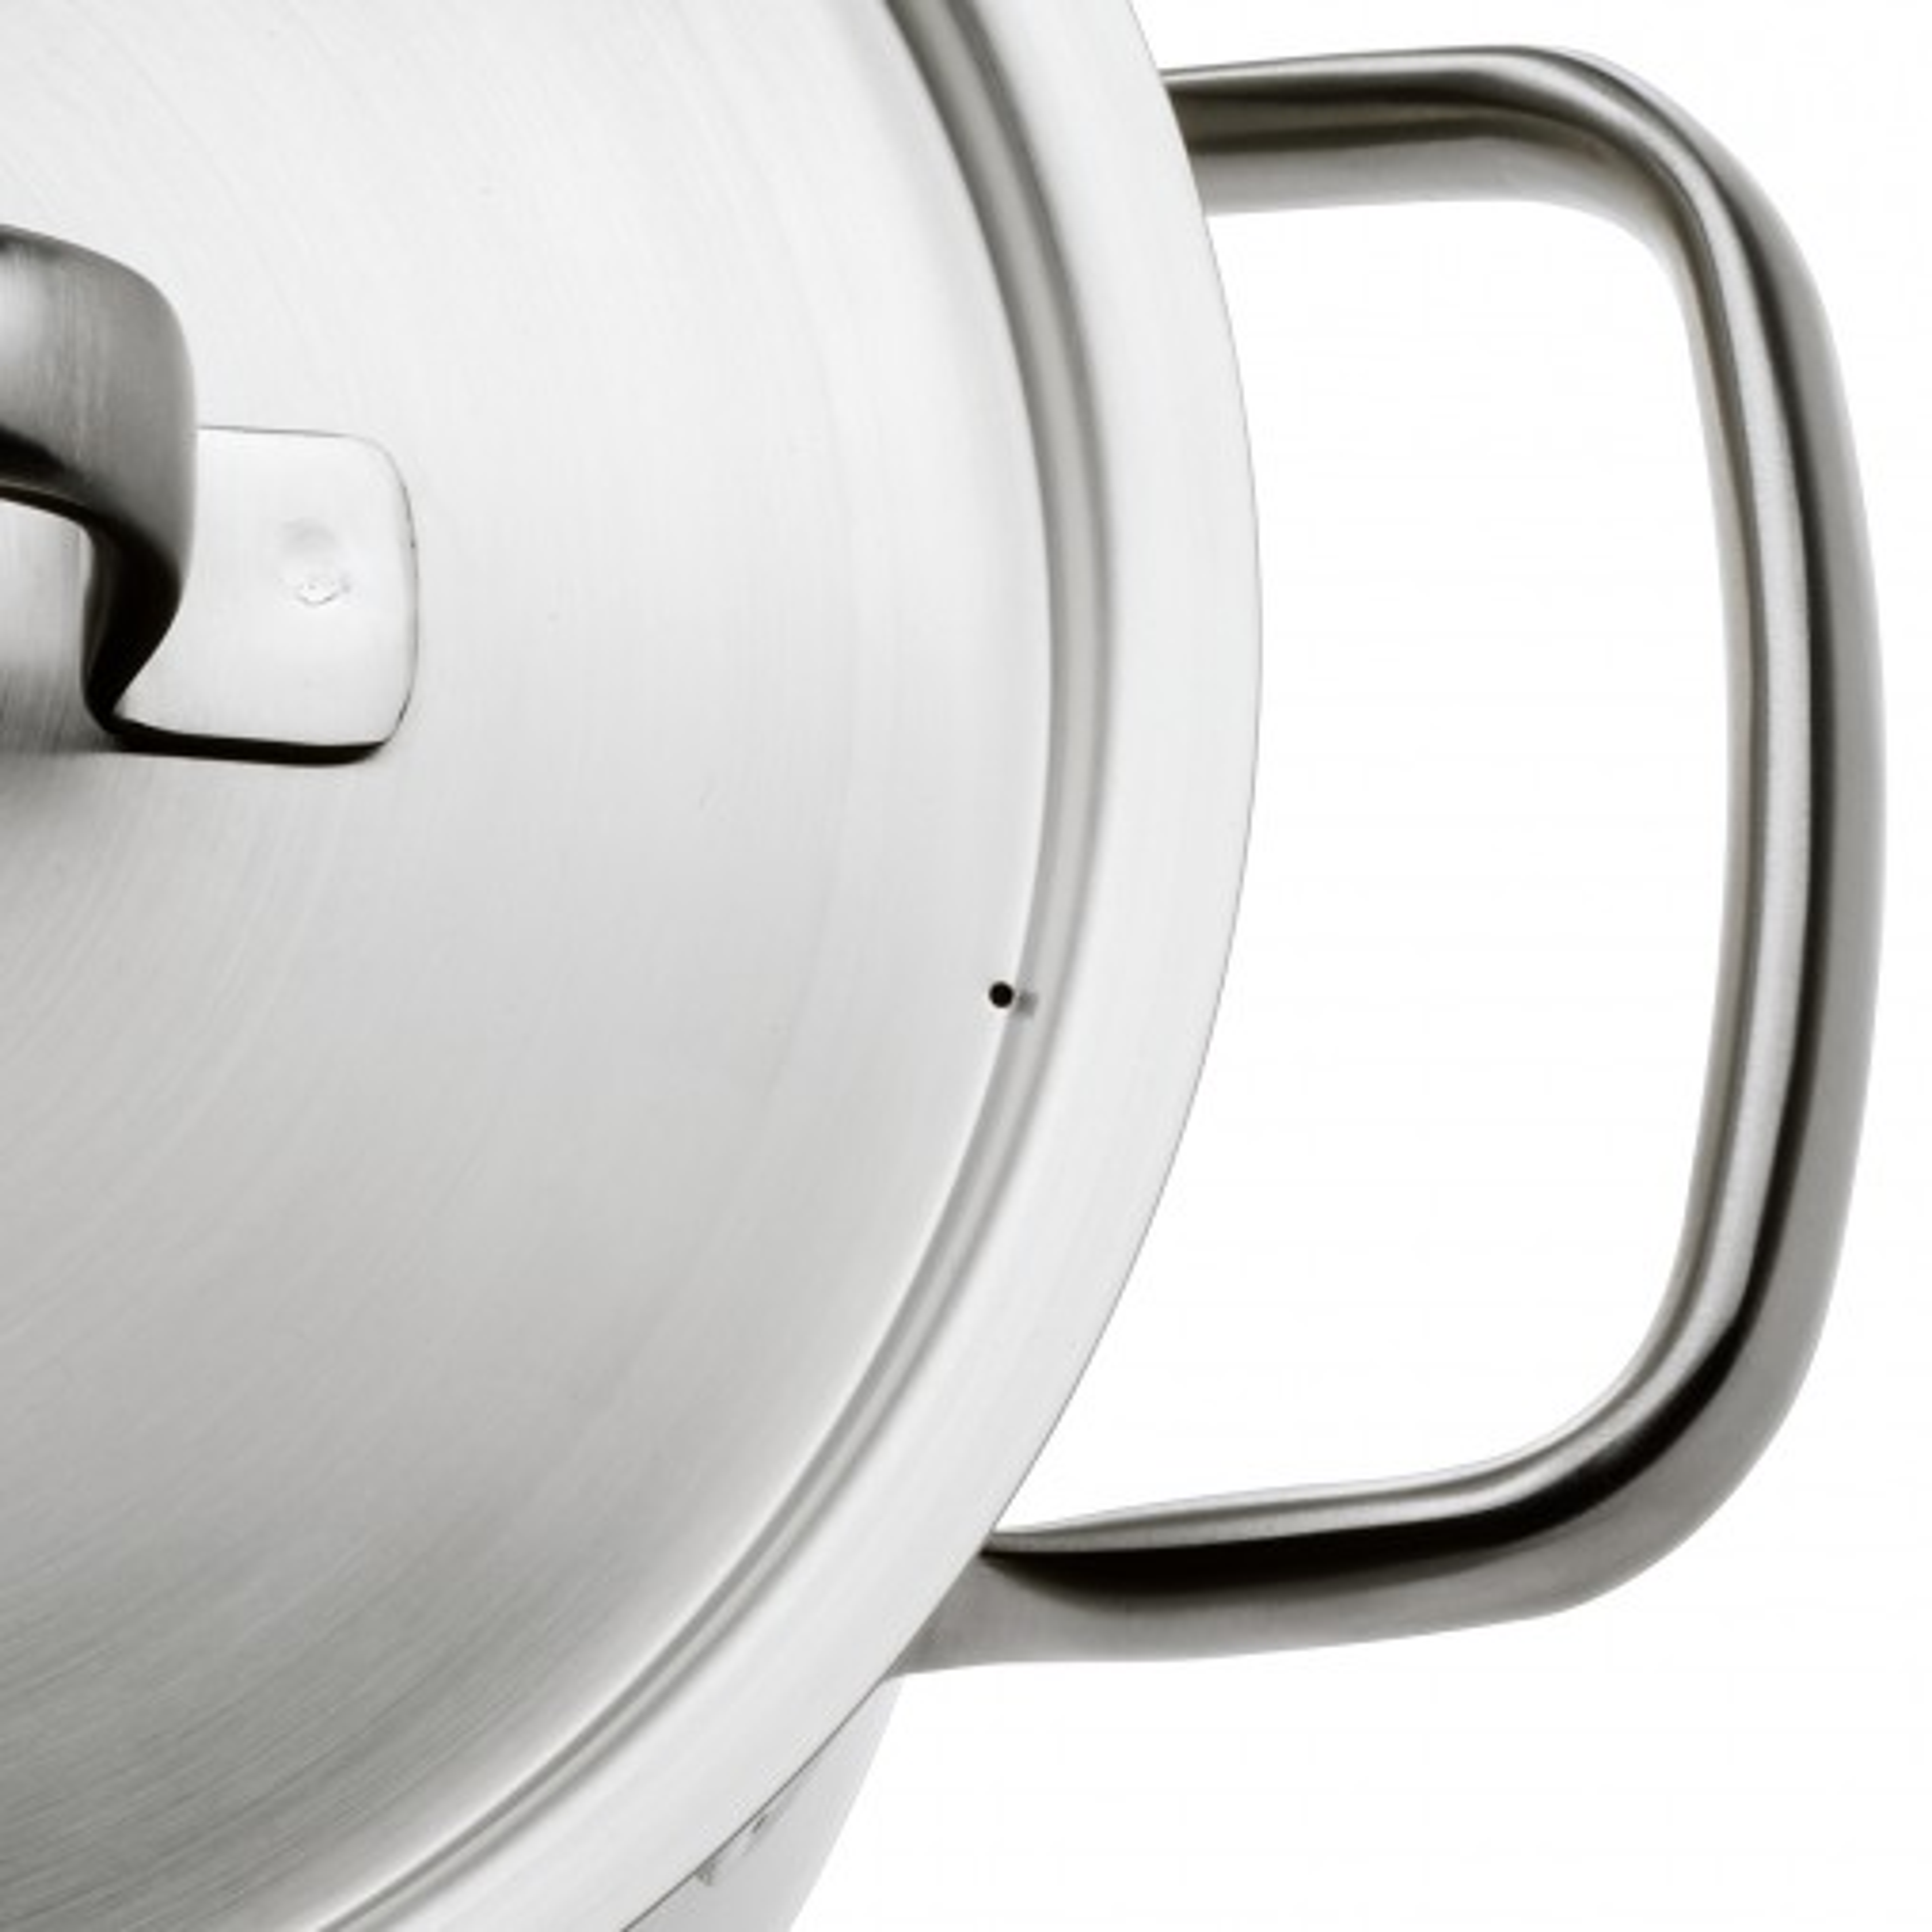 Hrniec s pokrievkou Gourmet Plus WMF 24 cm 5,7 l